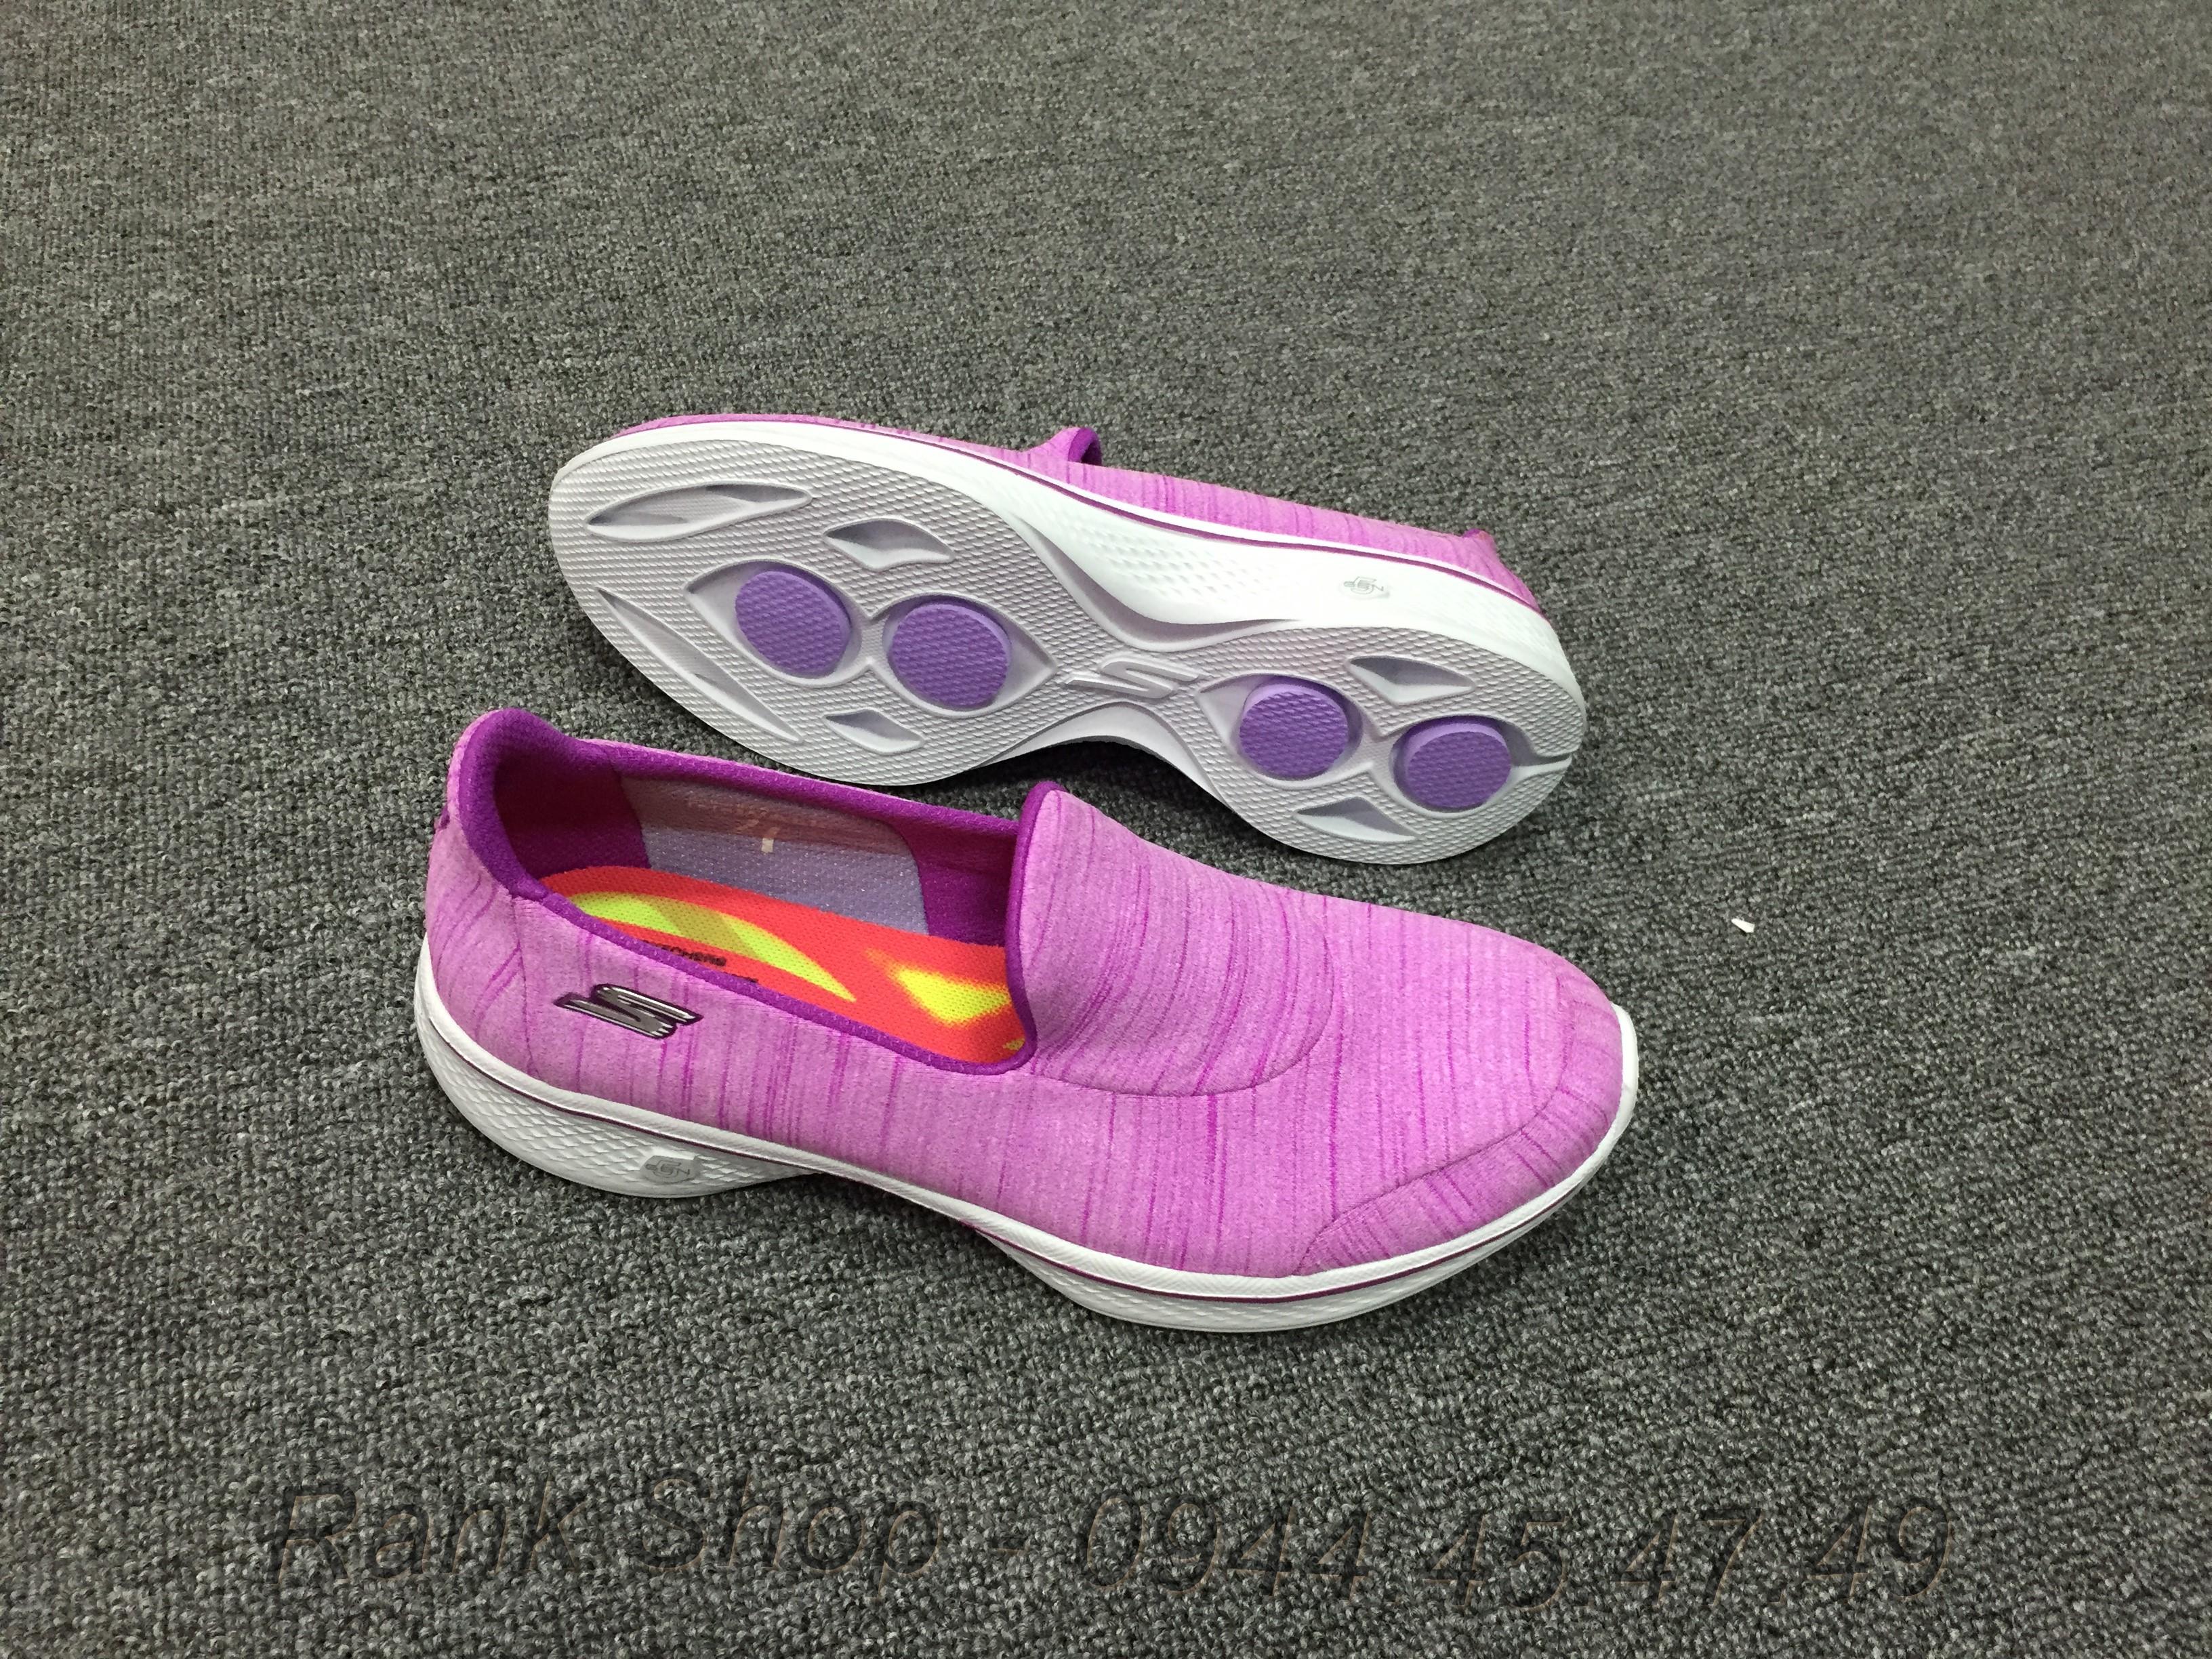 6 Giày thể thao nữ Skechers vnxk